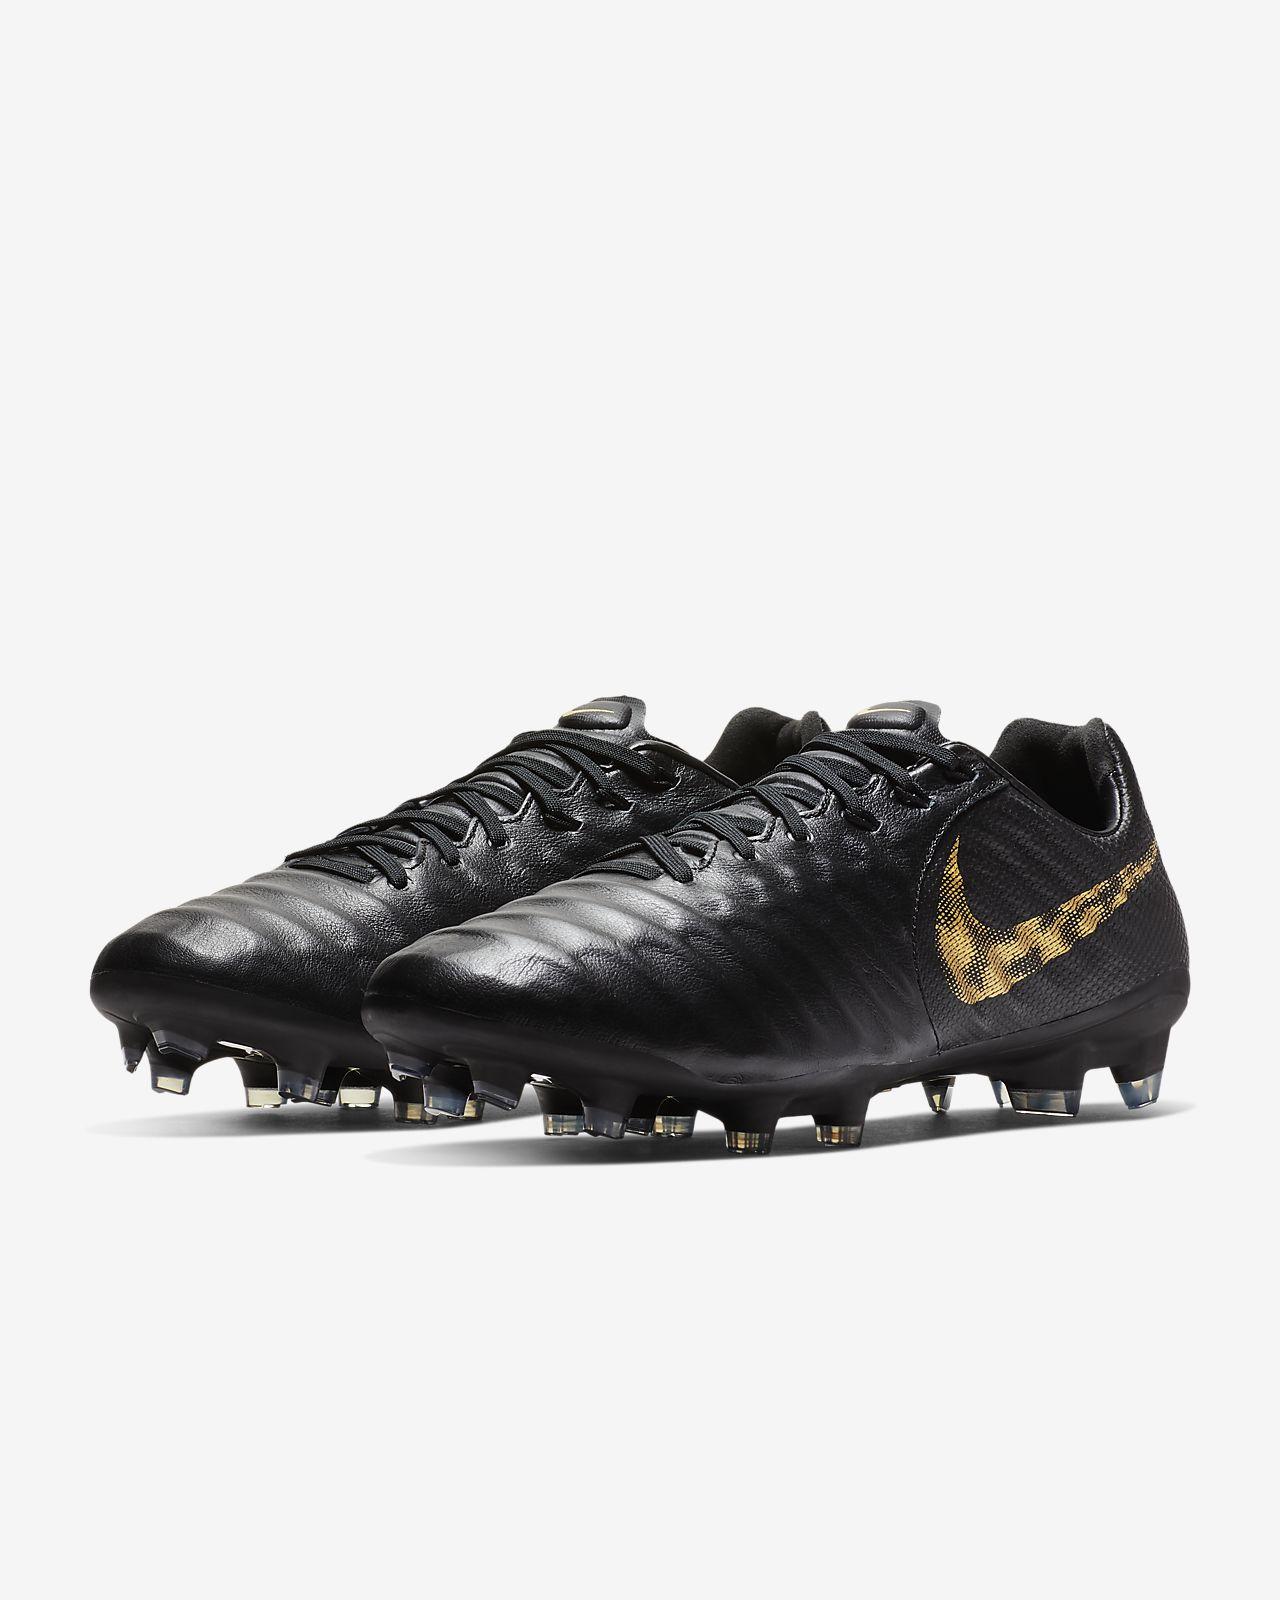 Nike Legend 7 Pro FG Firm Ground Football Boot